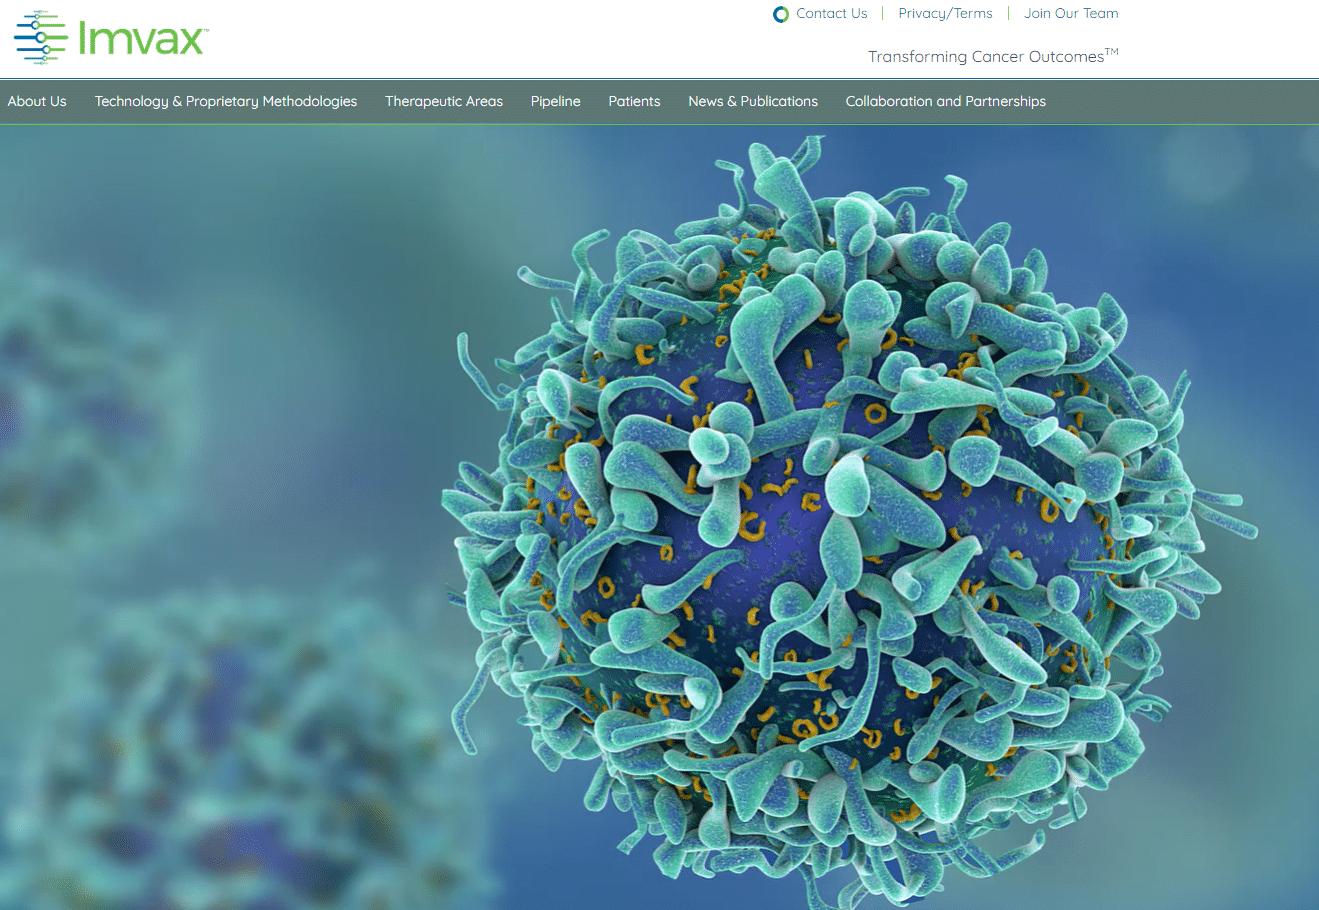 Imvax biotech website Malignant glioma hepatocellular carcinoma pancreatic cancer